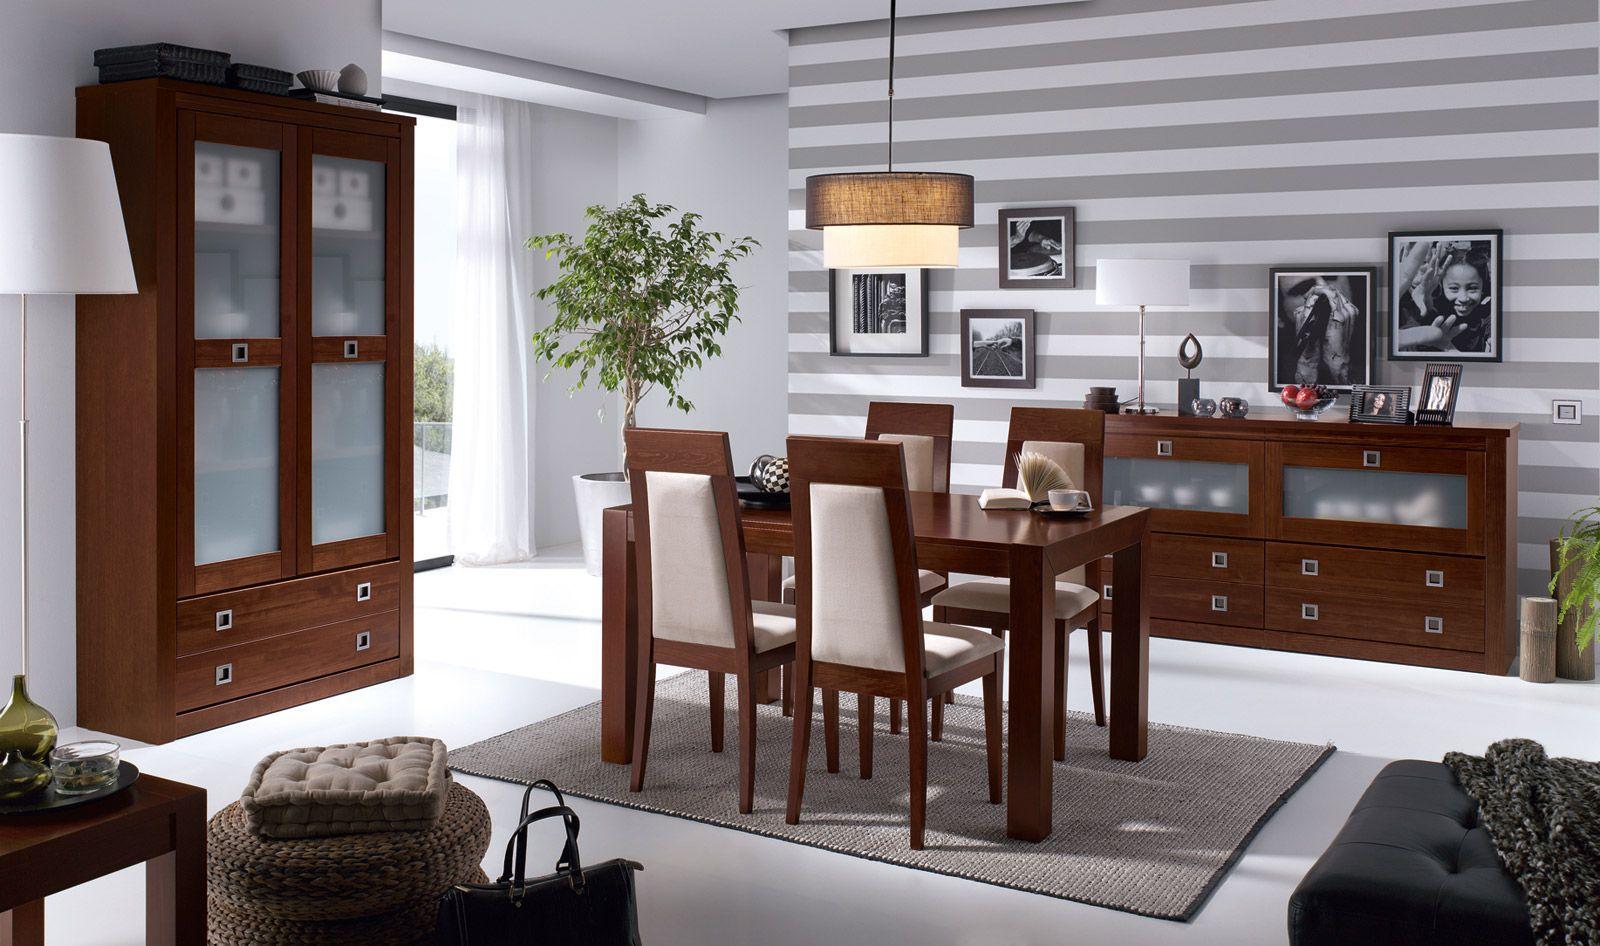 Sofassinfin.es Catálogo de muebles de salón, comedores, dormitorios ...